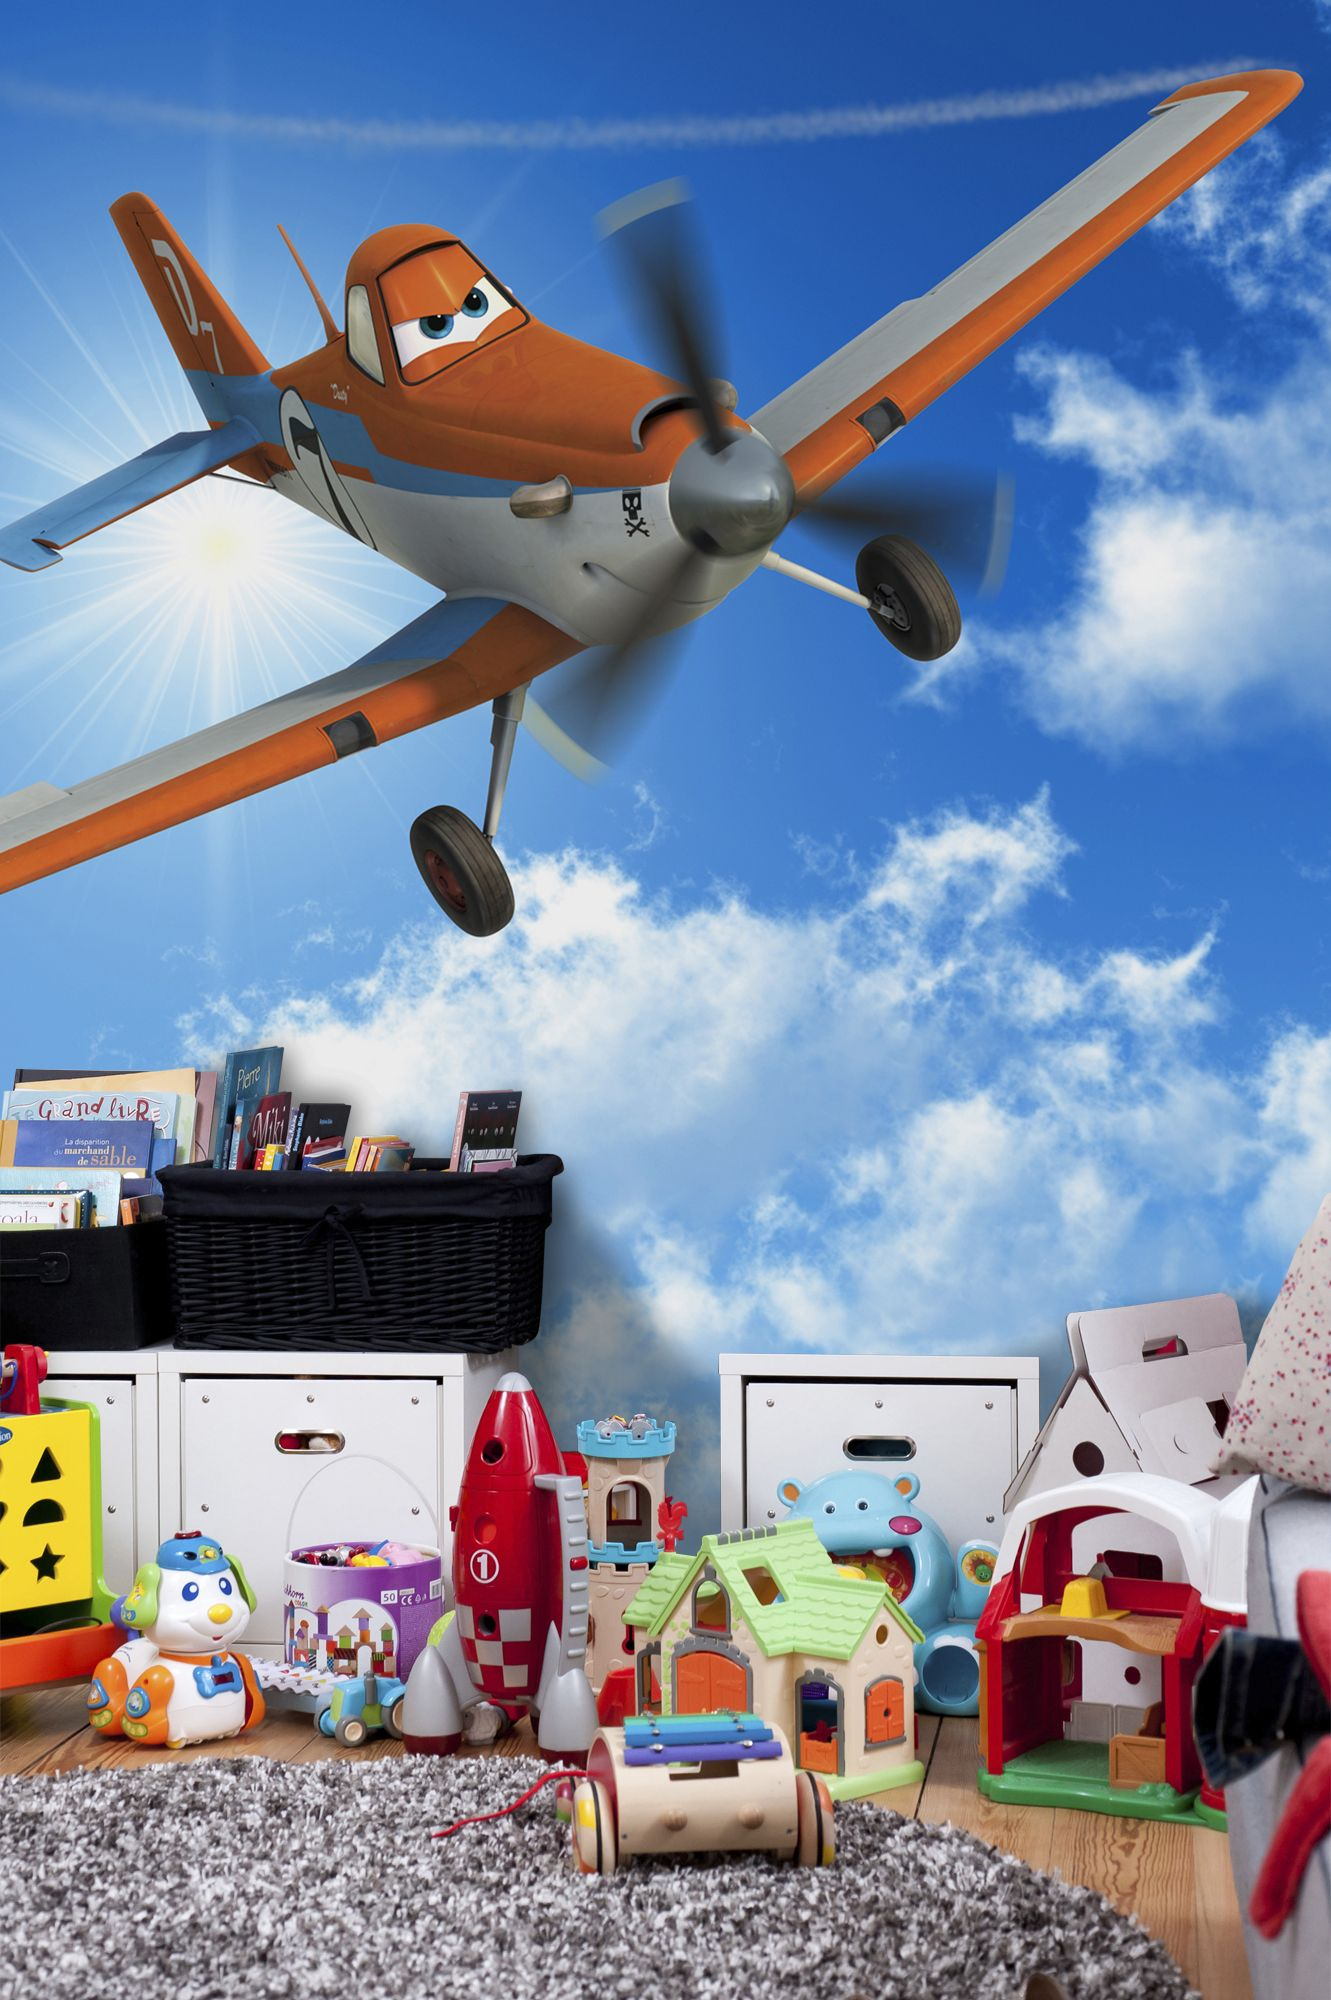 Dusty In The Sky Disney Planes Photowall Wallpaper Wall Murals